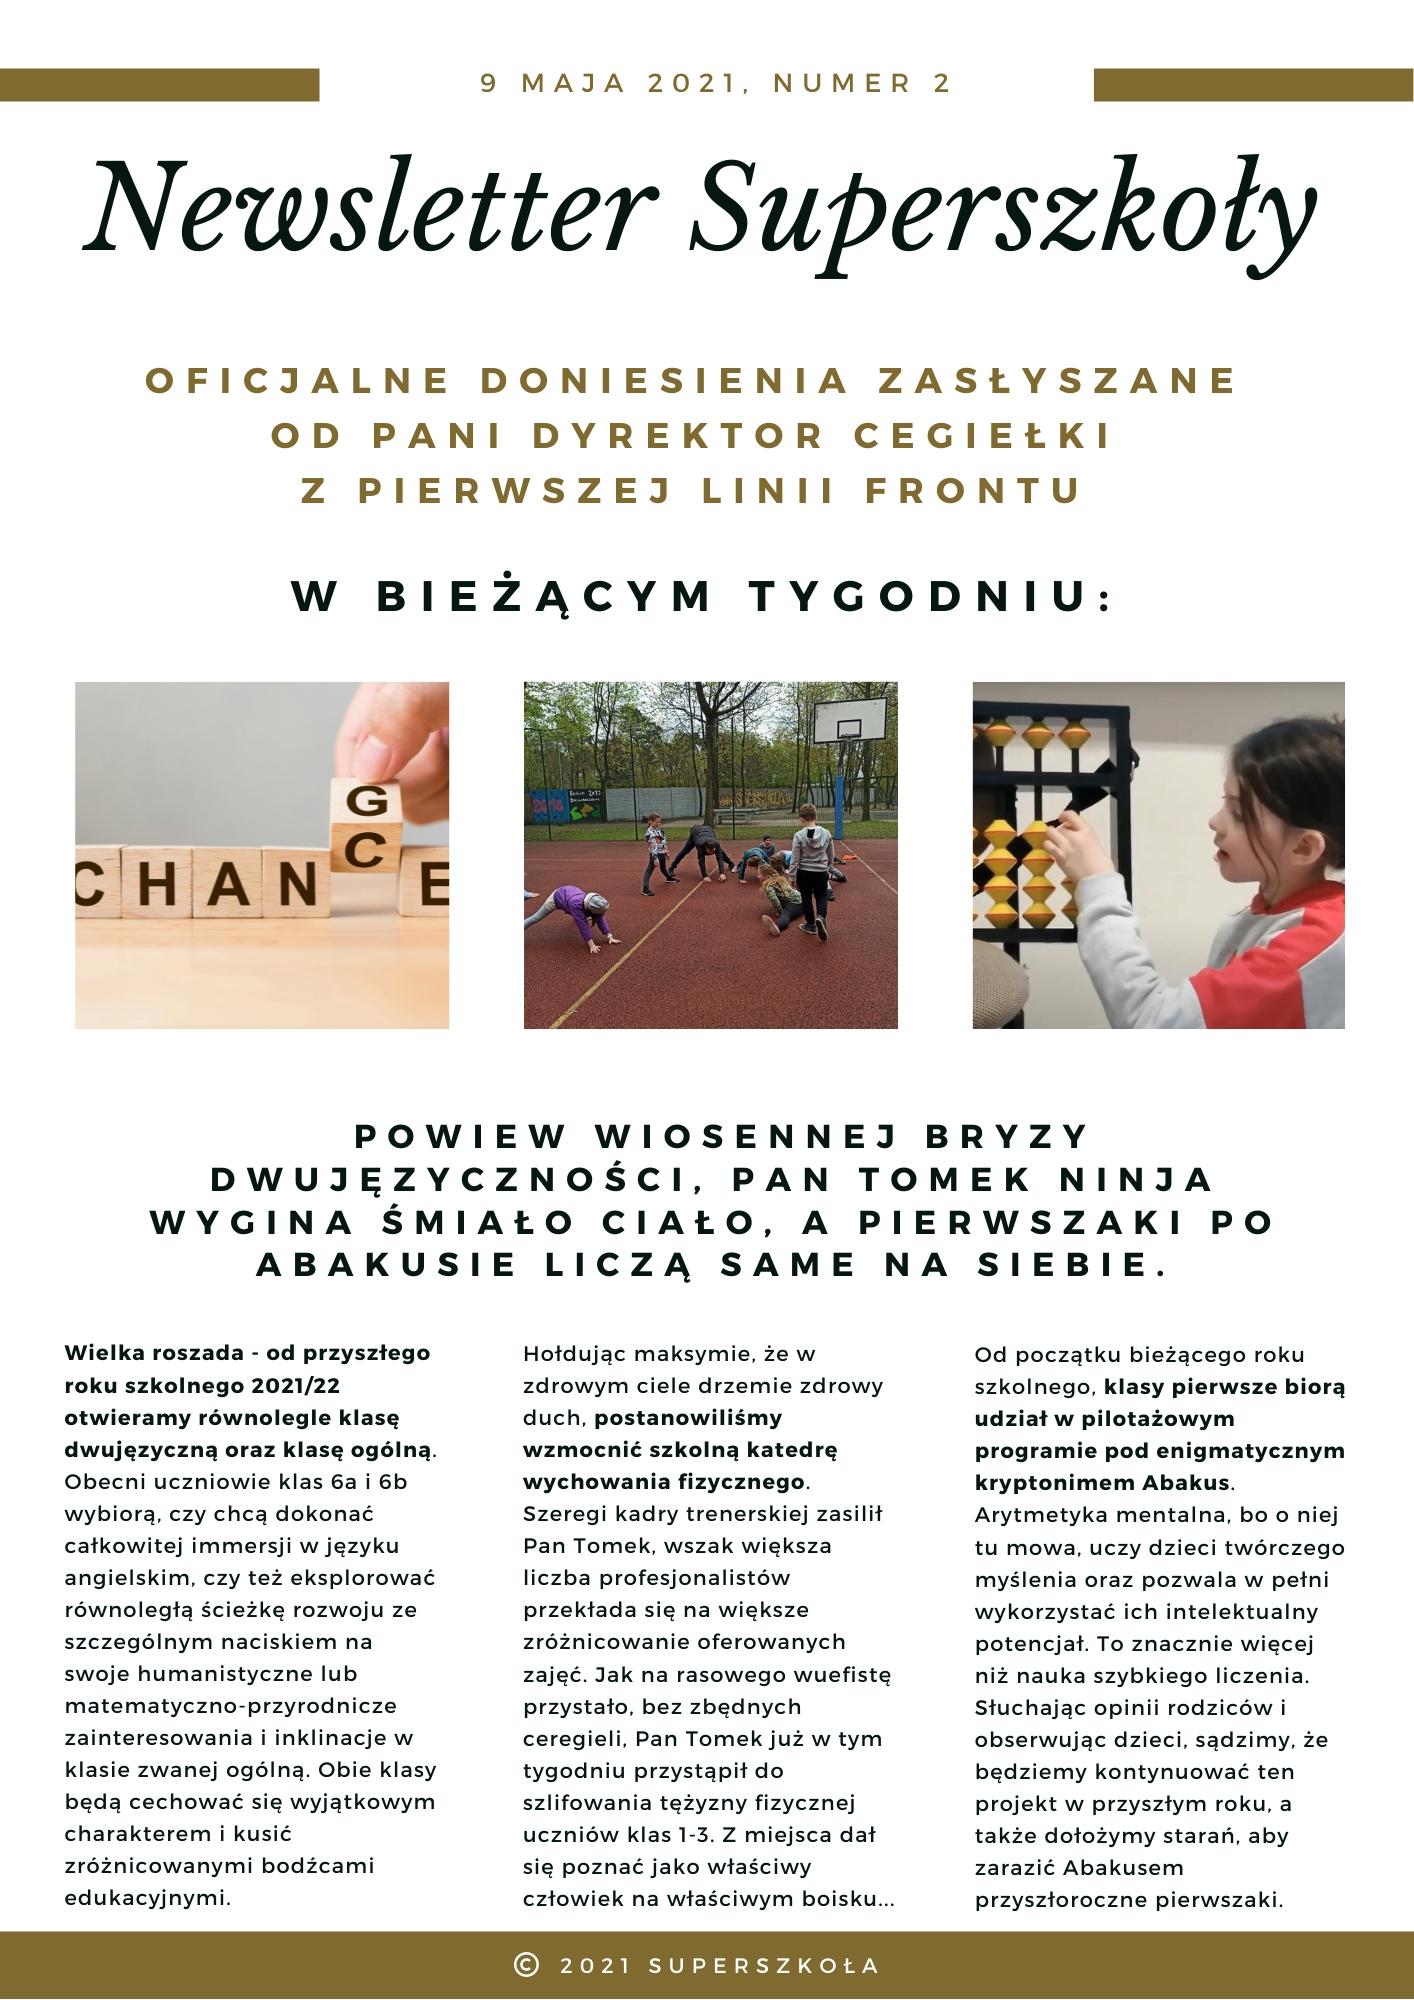 Newsletter_Superszkoły_2